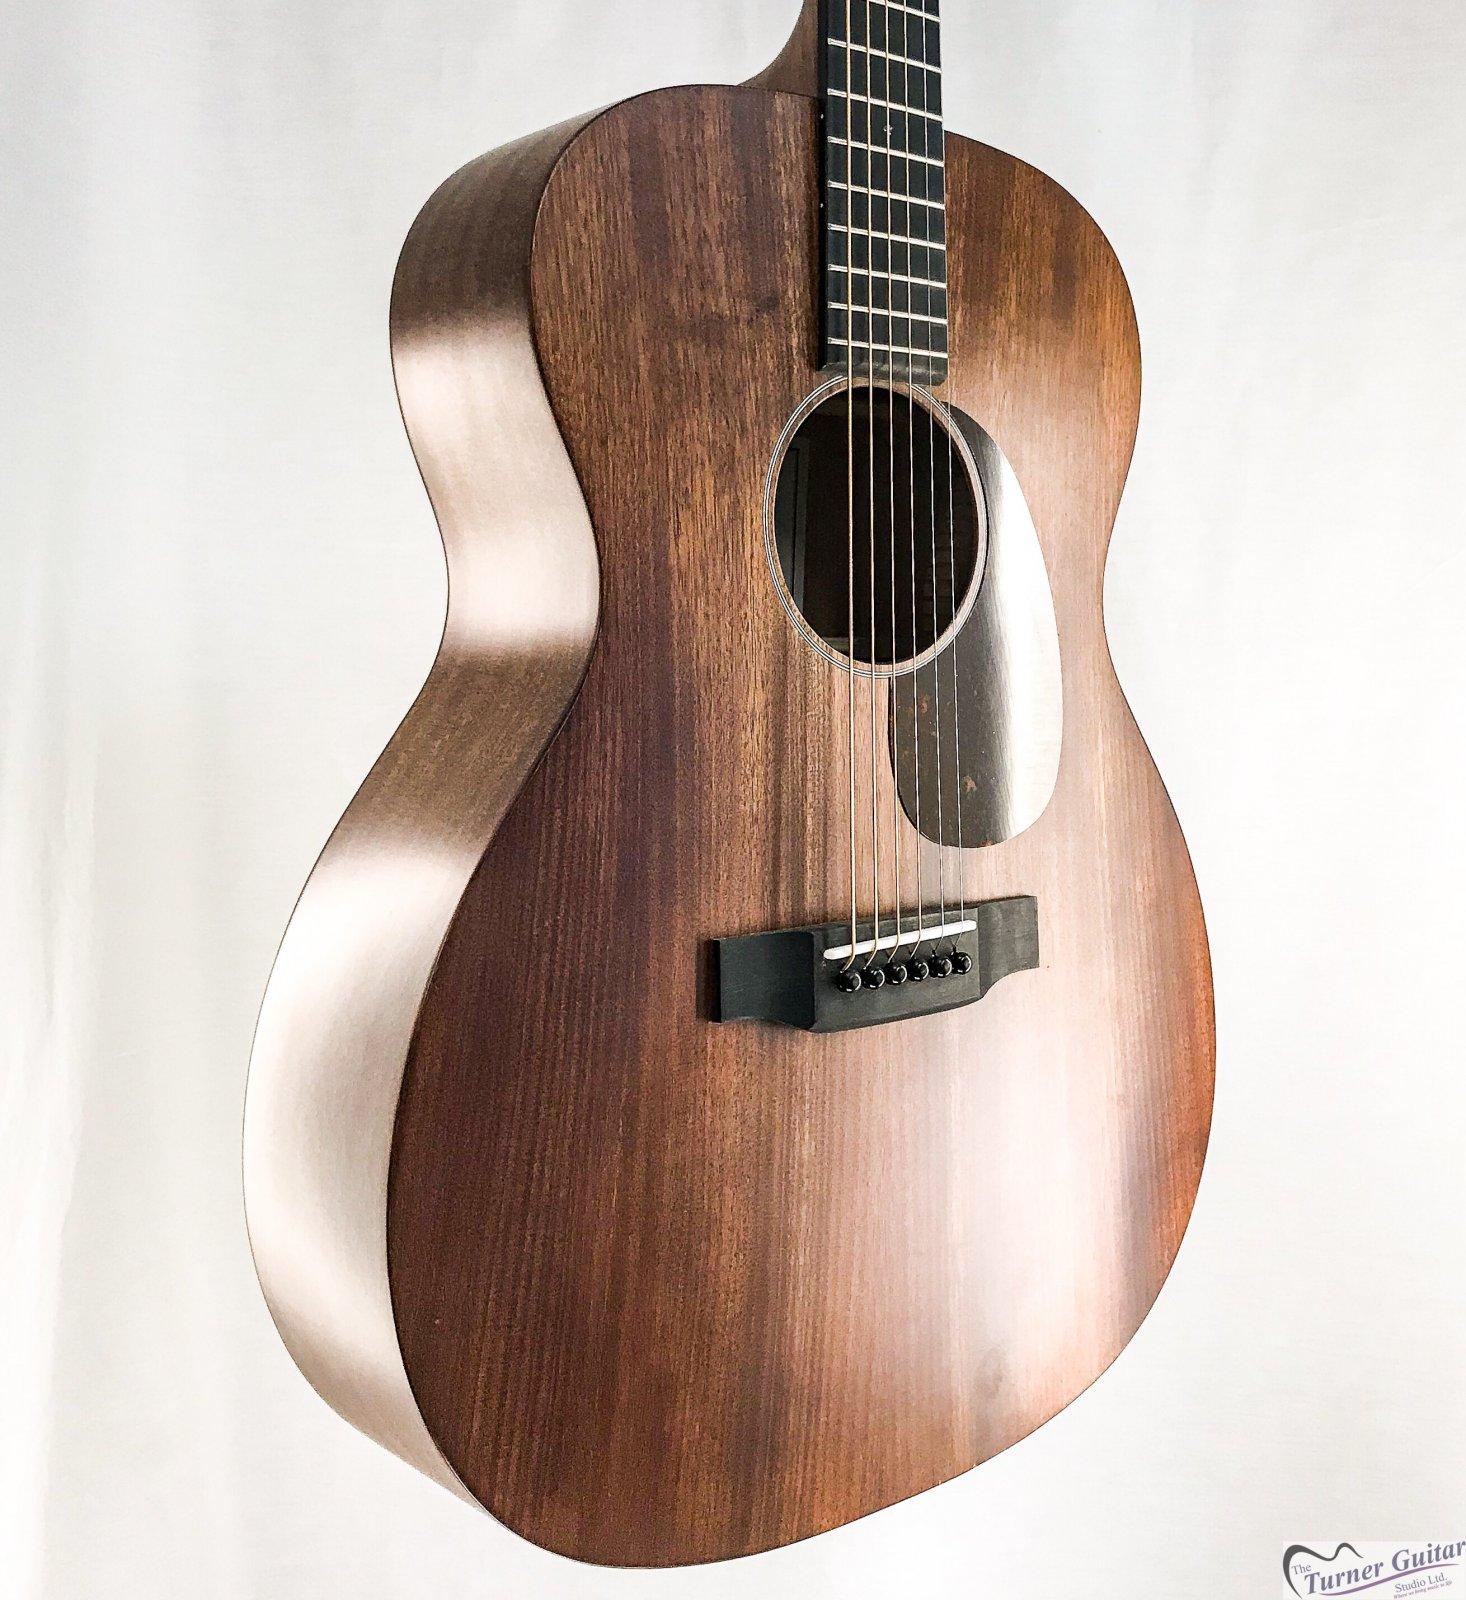 Sigma 000M-15+ Folk Size Acoustic - Solid Mahogany Top